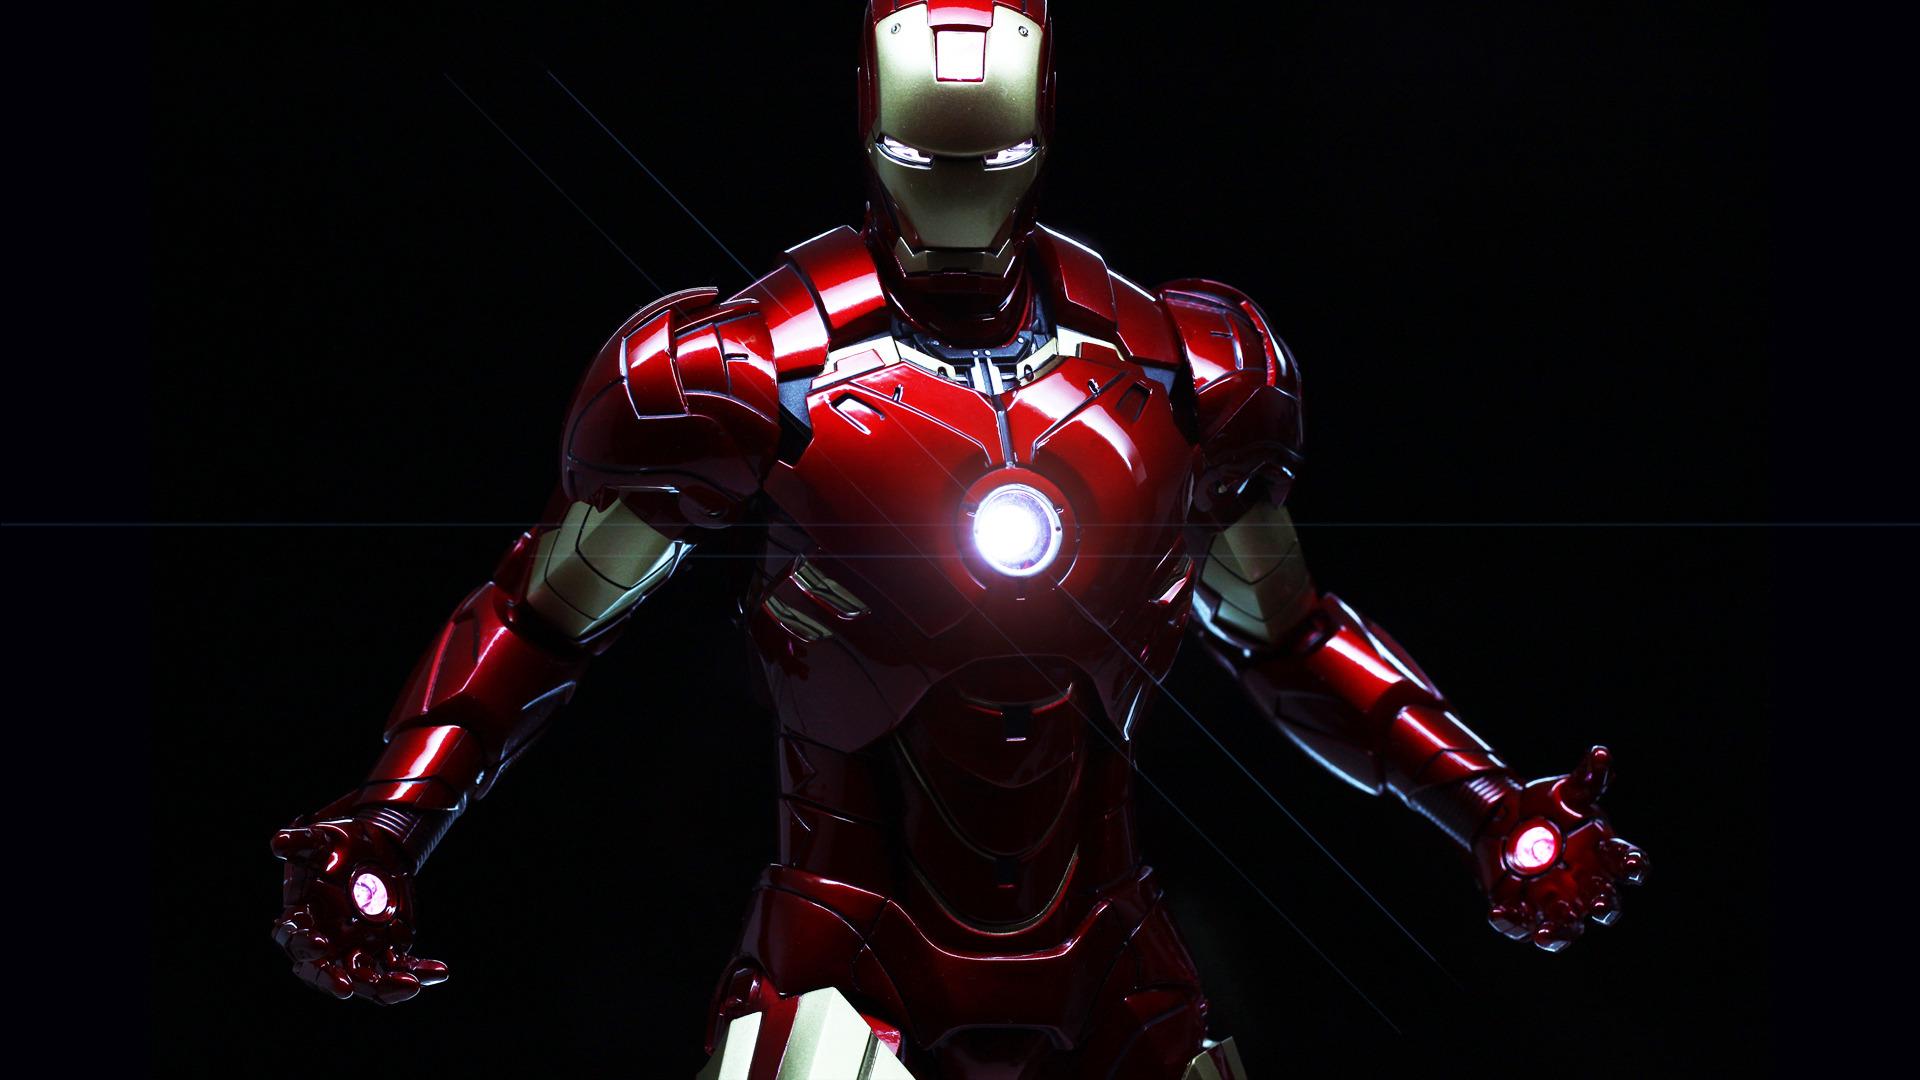 Iron Man Wallpaper HD 6894188 1920x1080